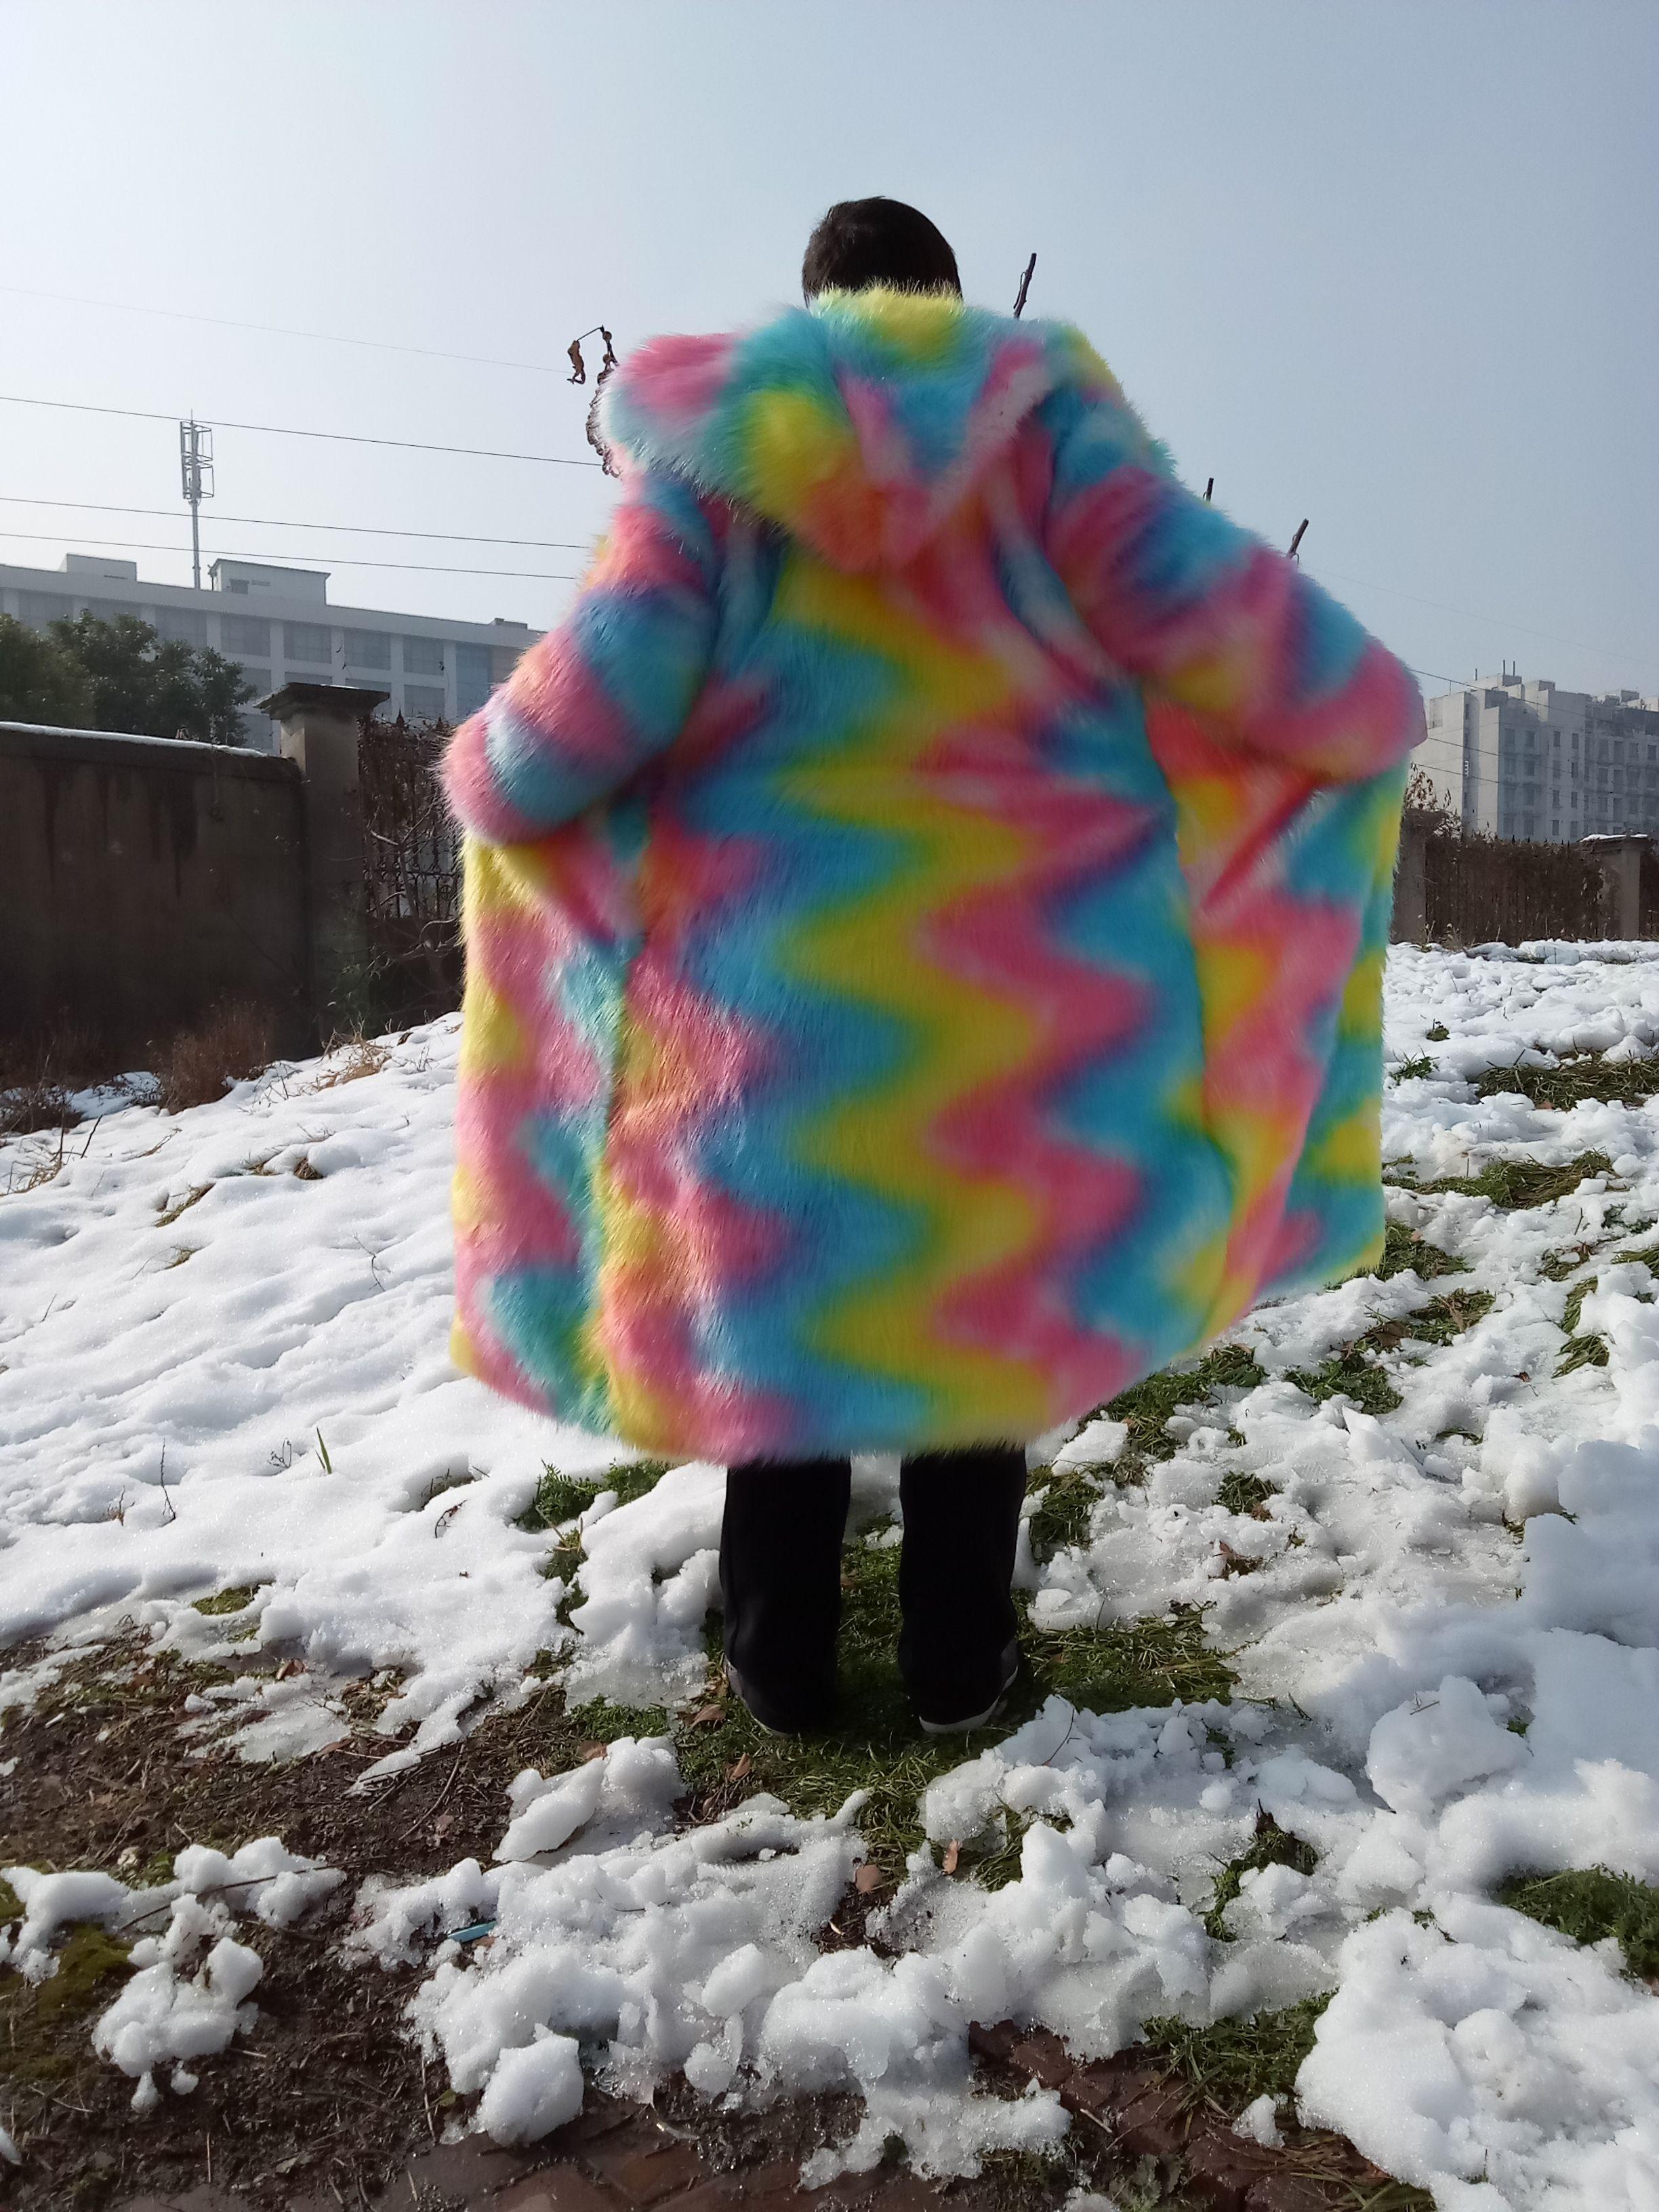 172 8us 20 Off Gtgyff Mens Artificial Fur Jacket Coat With Hood Autumn Winter Men Hoodies Rainbow Faux Fur Outerwear Coat Man S 5xl Oversize Faux Leather Coa Faux Leather Coat Long Faux [ 3264 x 2448 Pixel ]